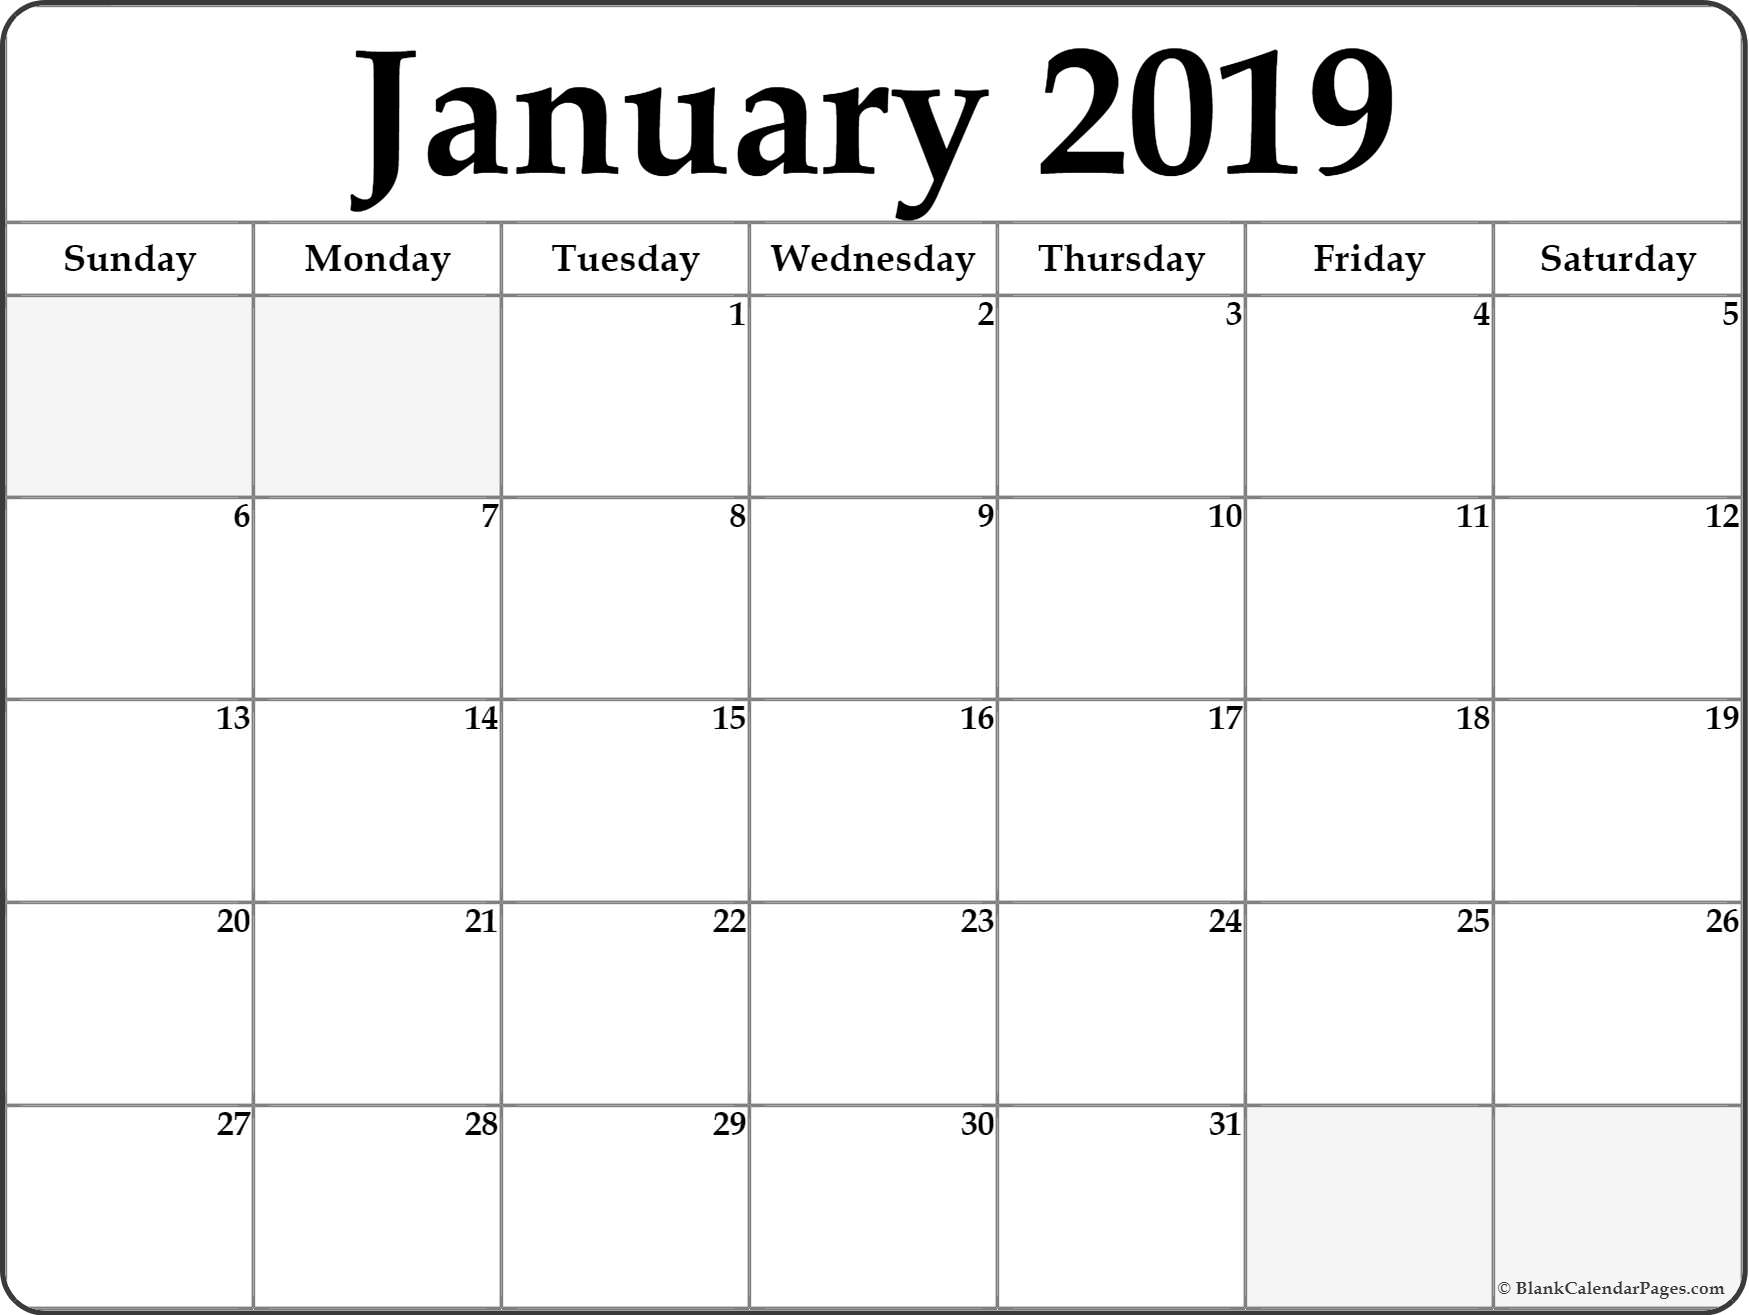 January 2019 Calendar Printable 2